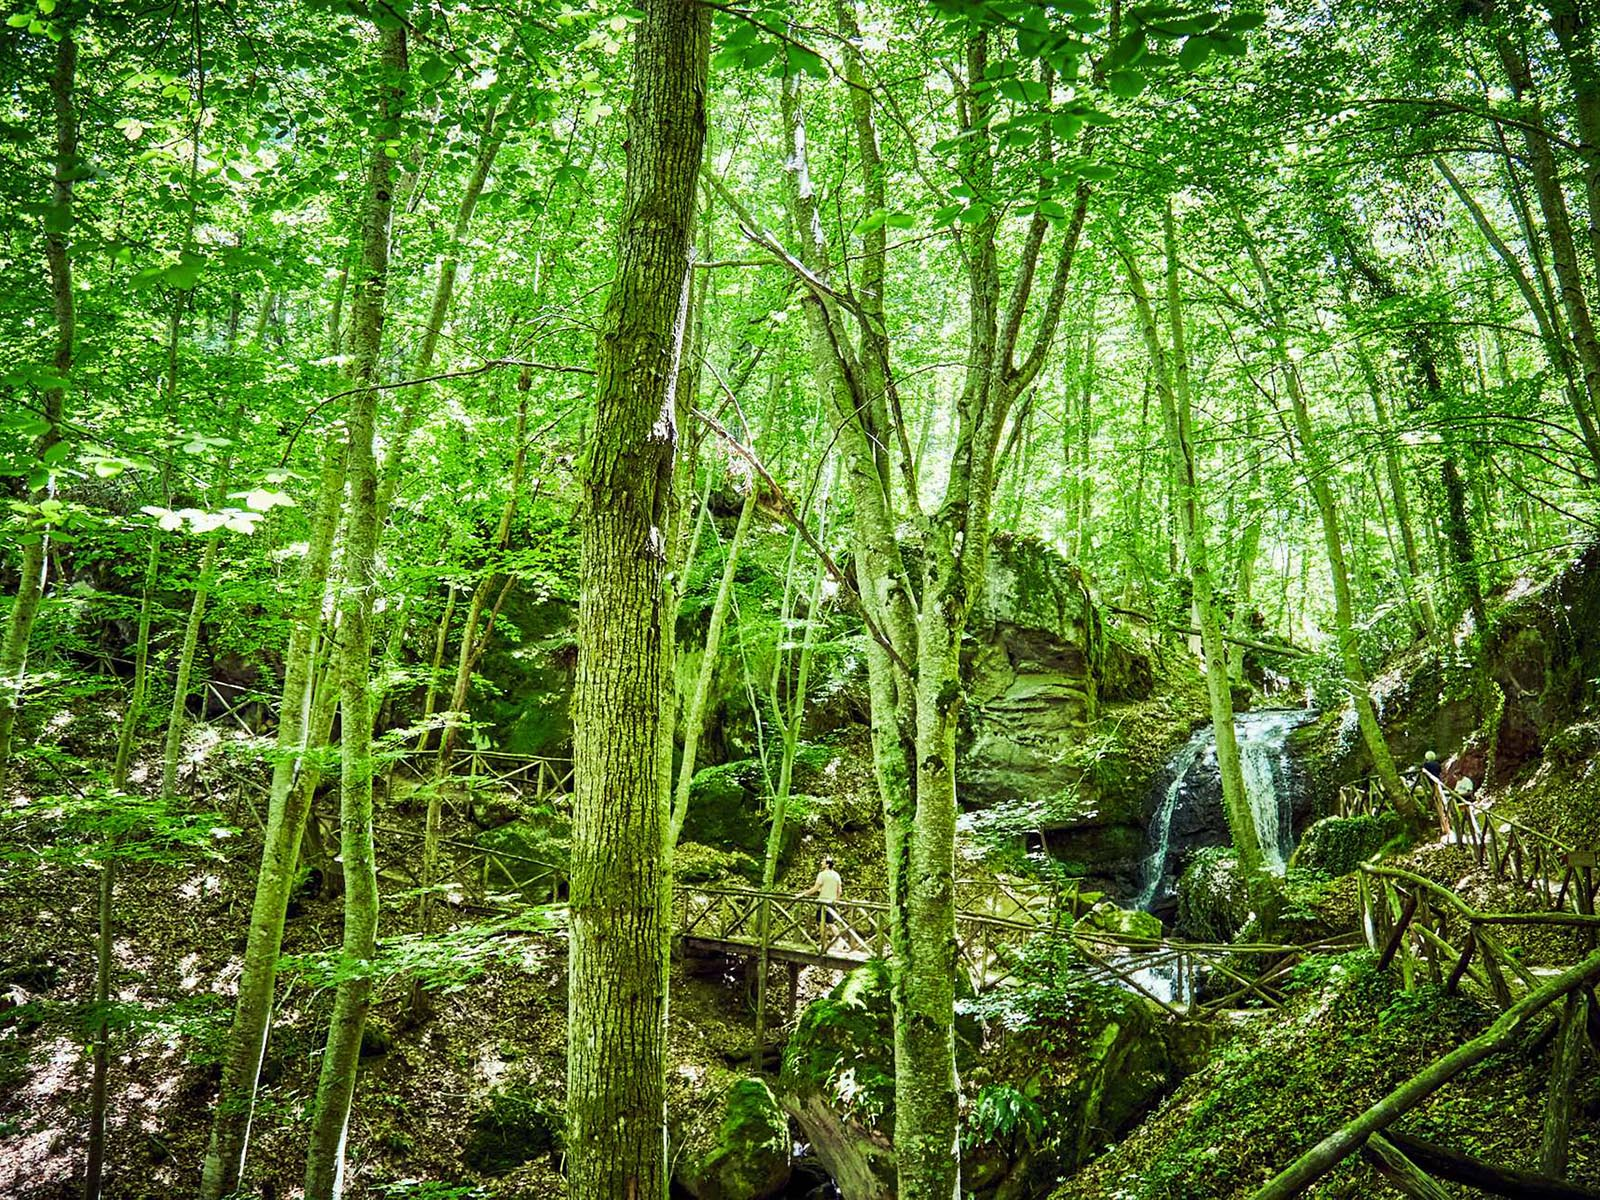 Siti d'interesse ambientale